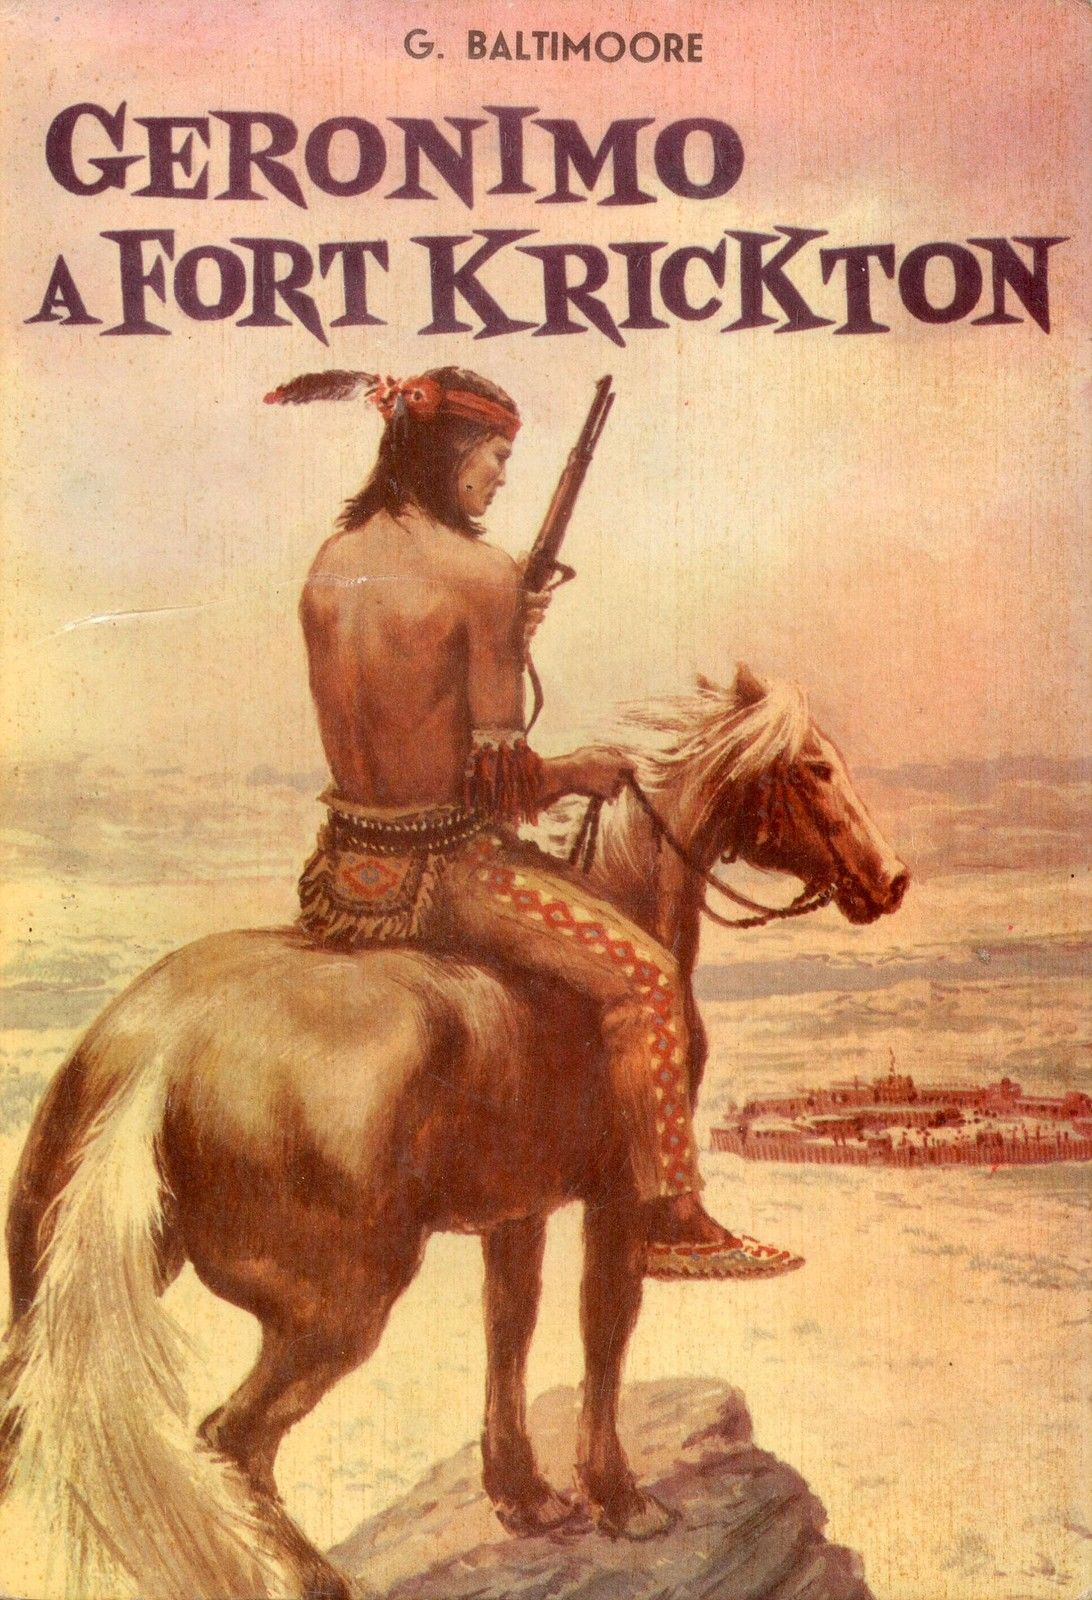 Geronimo a Fort Krickton